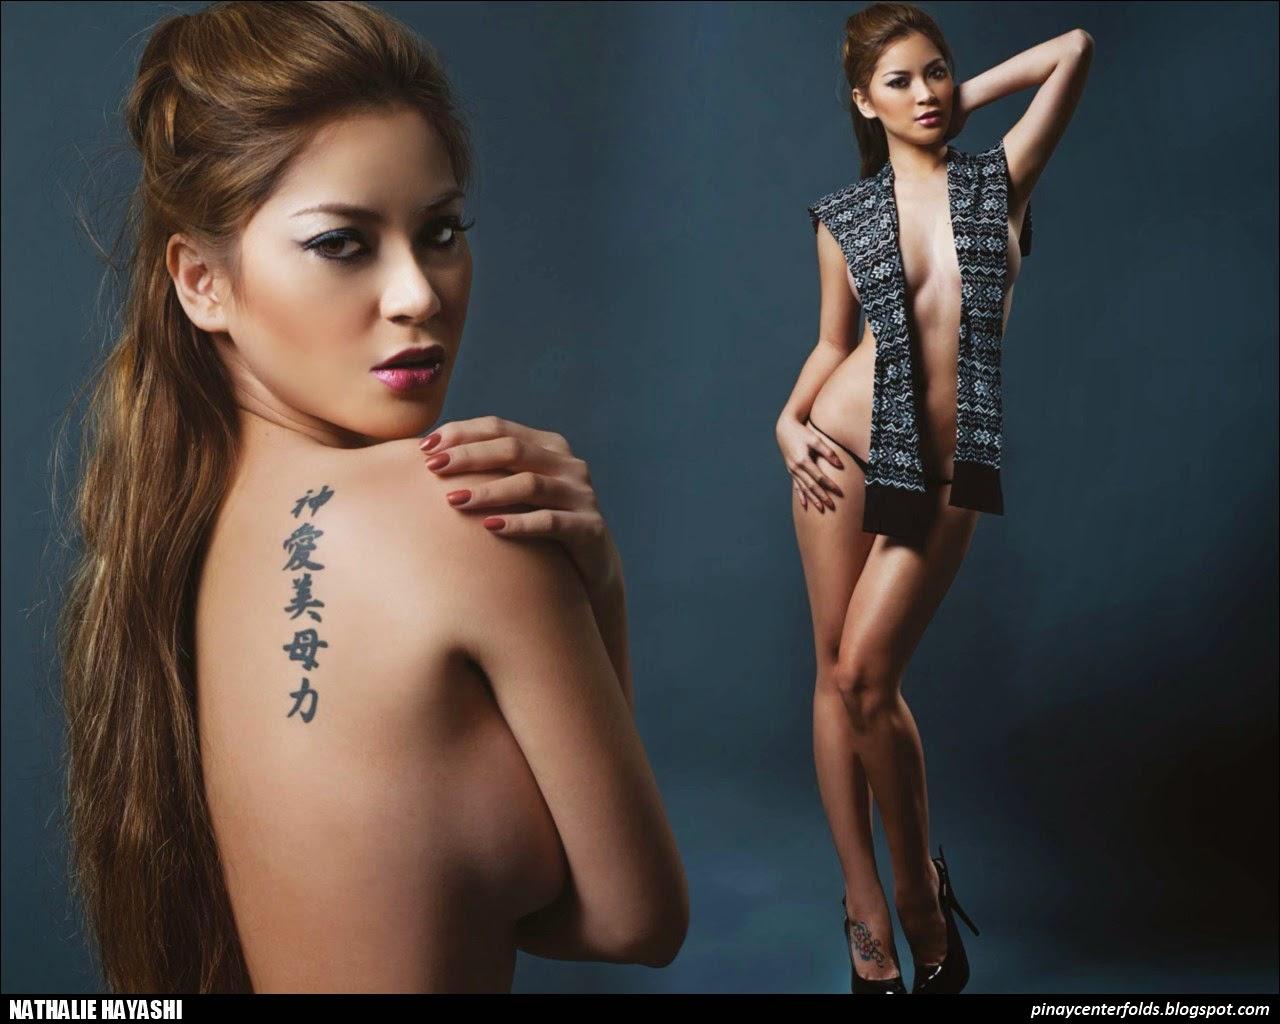 Nathalie Hayashi In Maxim 2